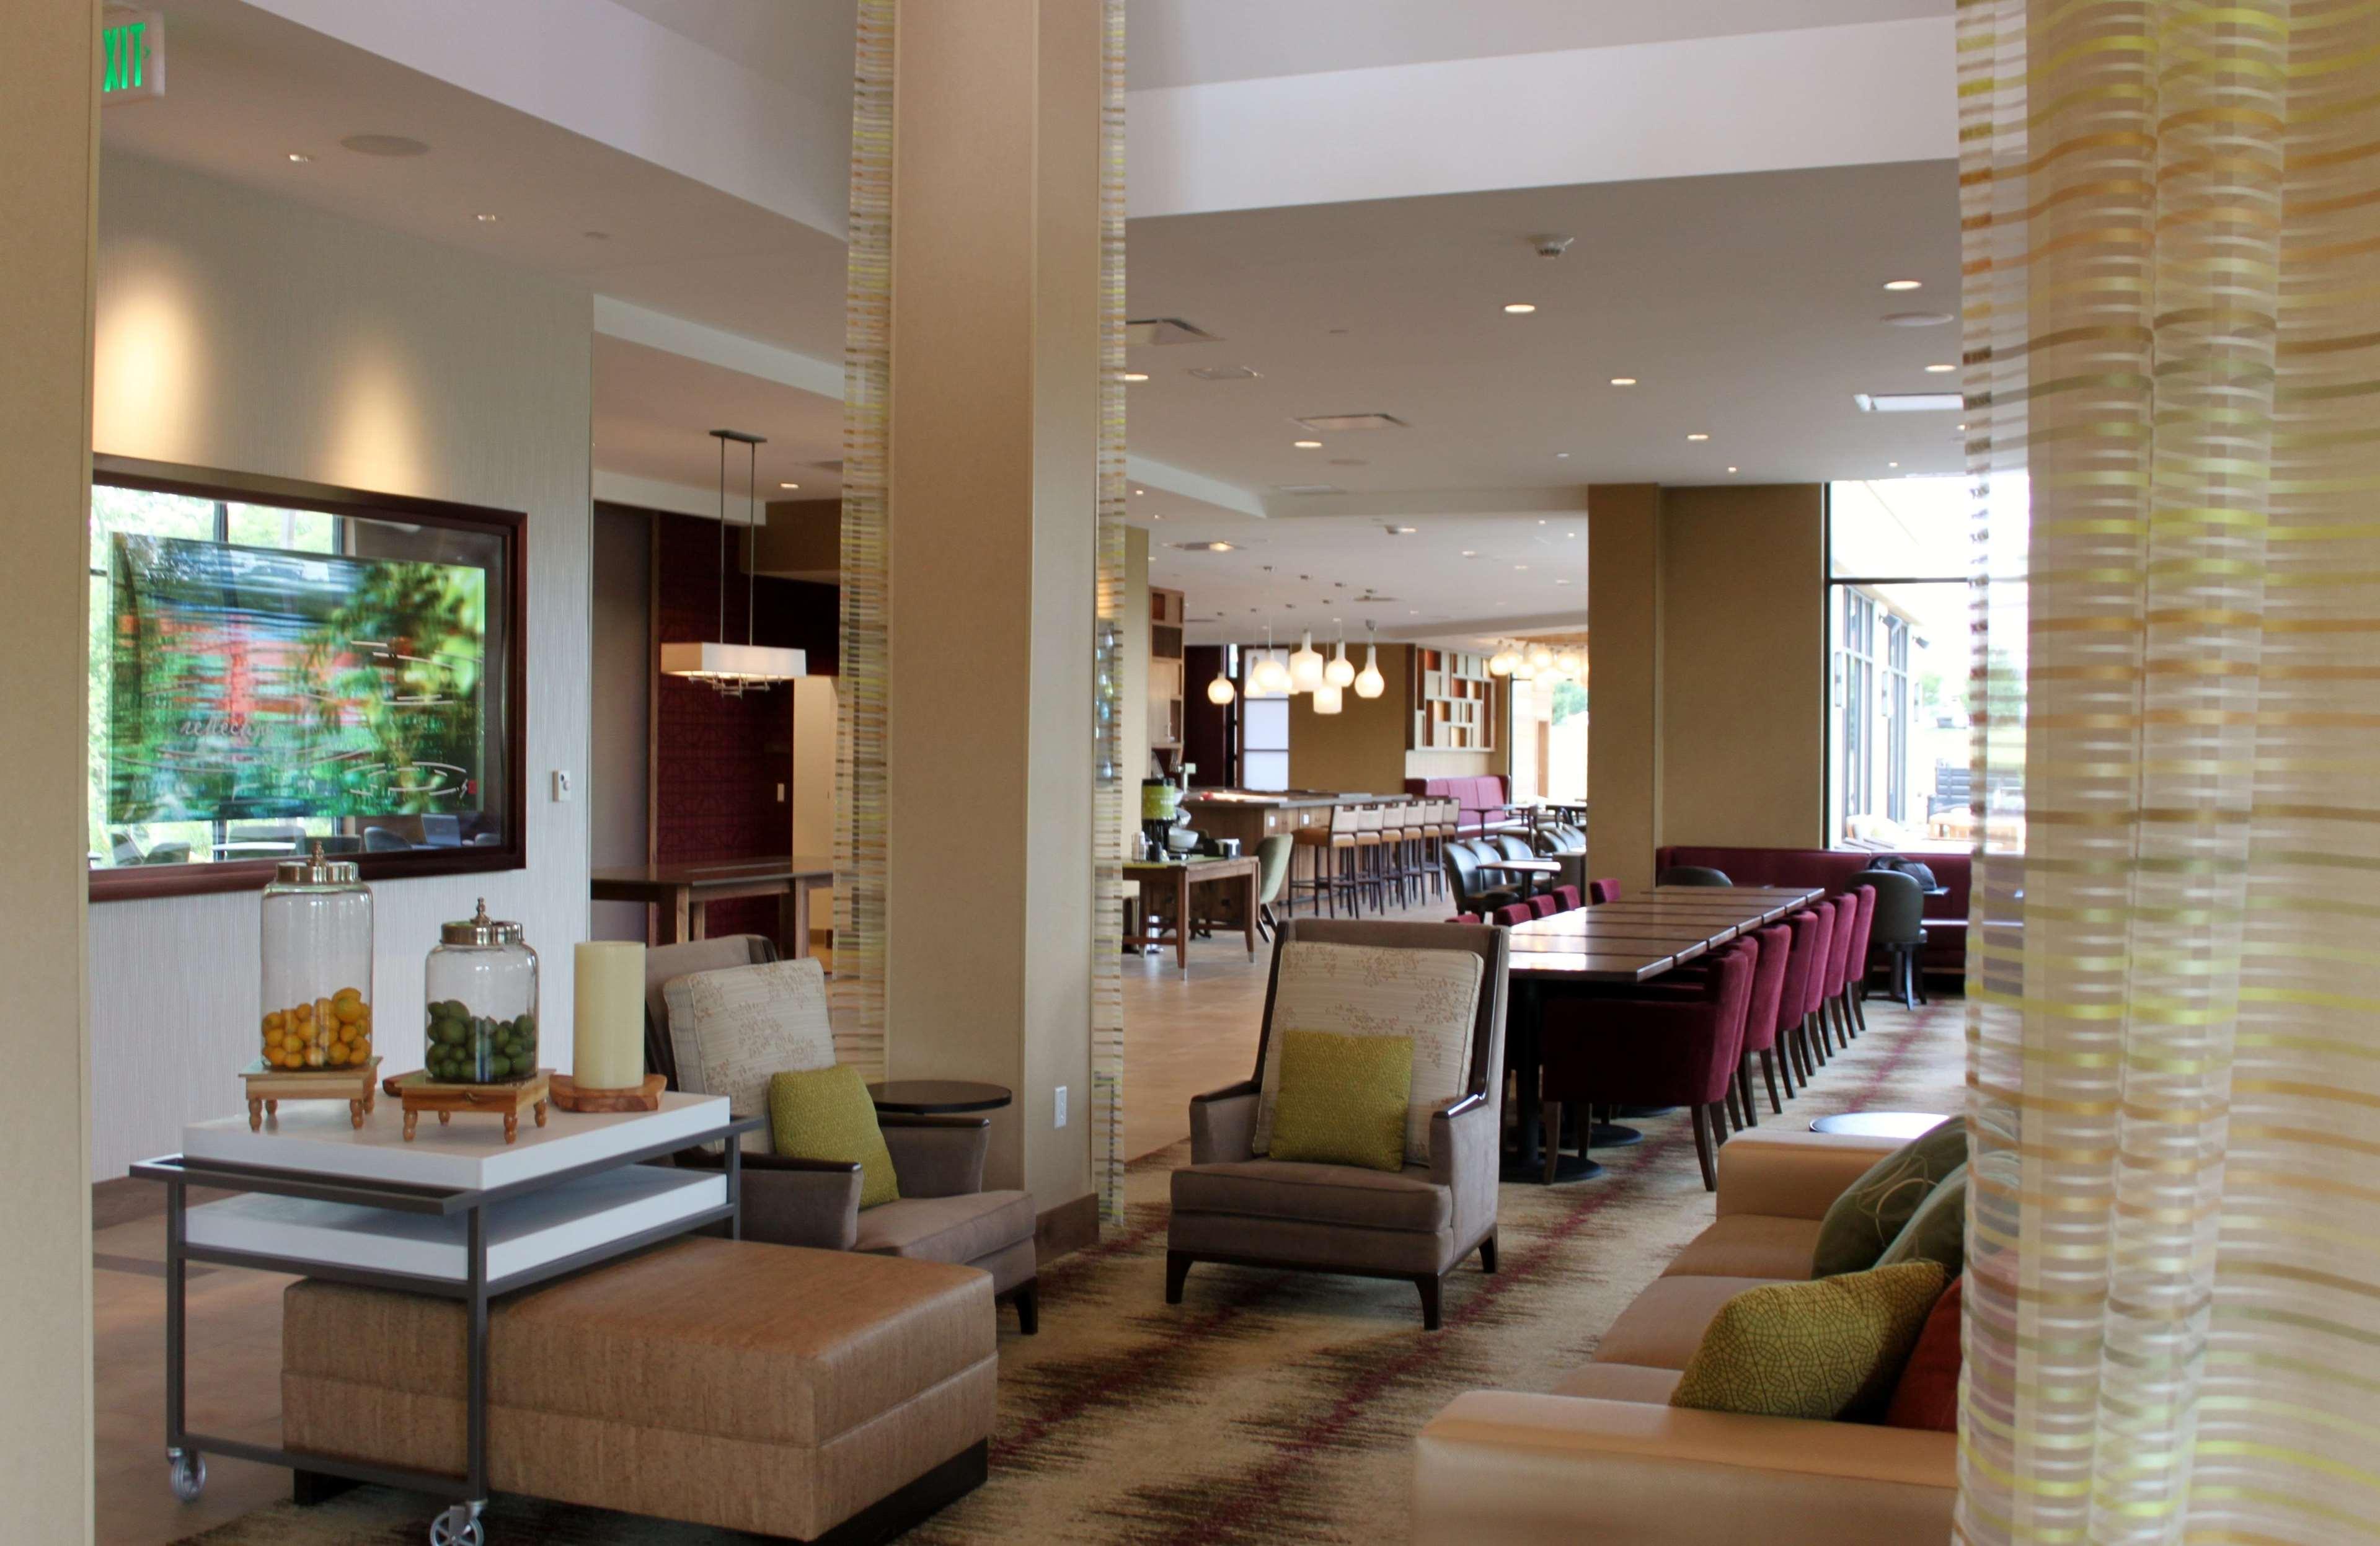 Hilton Garden Inn Boston/Marlborough image 23